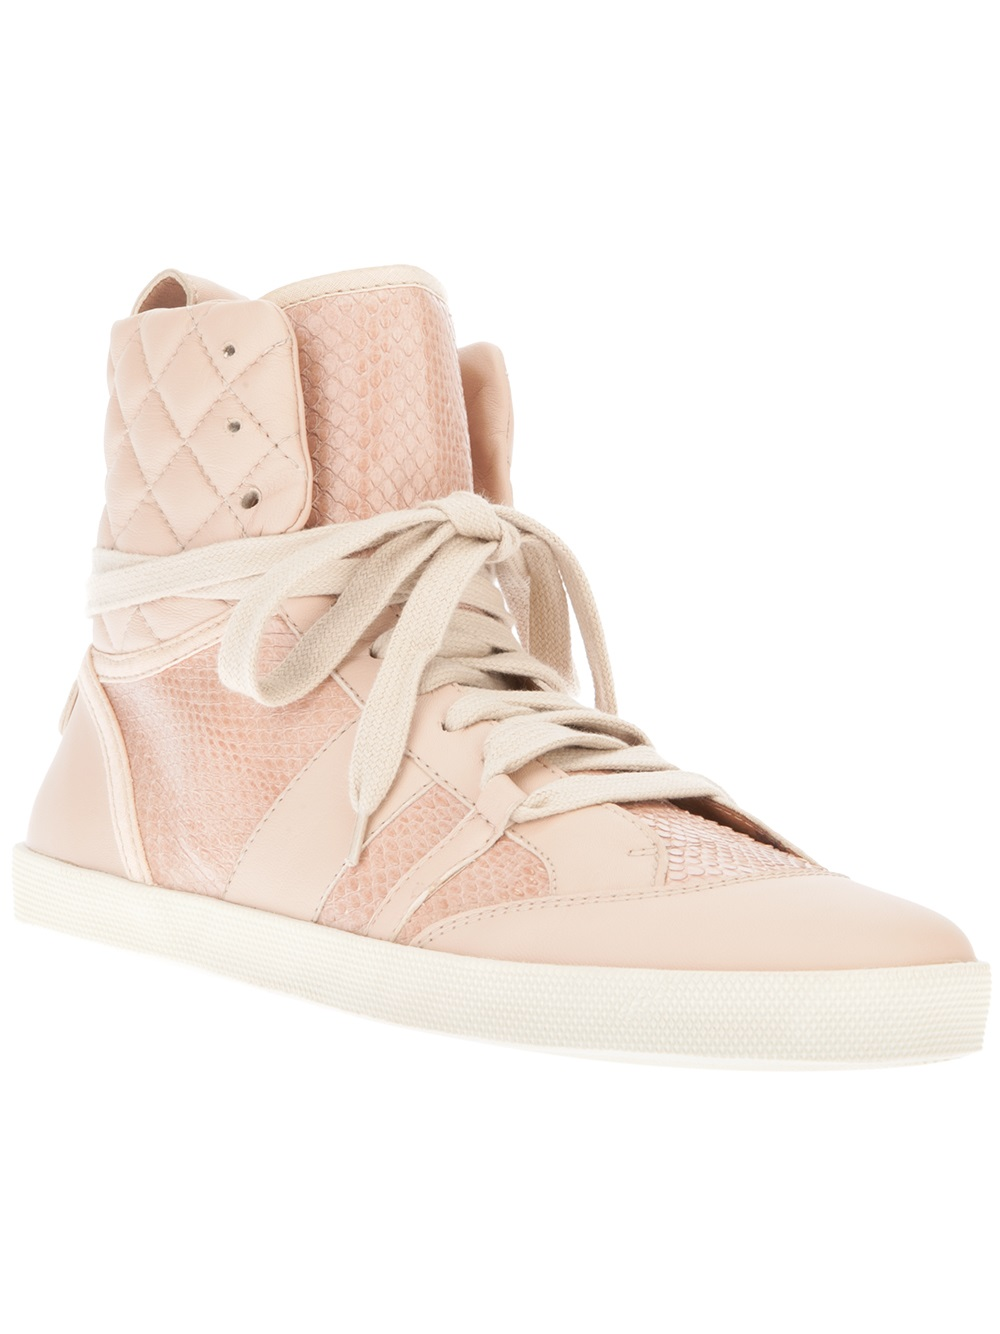 2bfe6d764ca306 Fearne Cotton Canvas Sneakers vs Michelle Heaton Canvas Sneakers ...